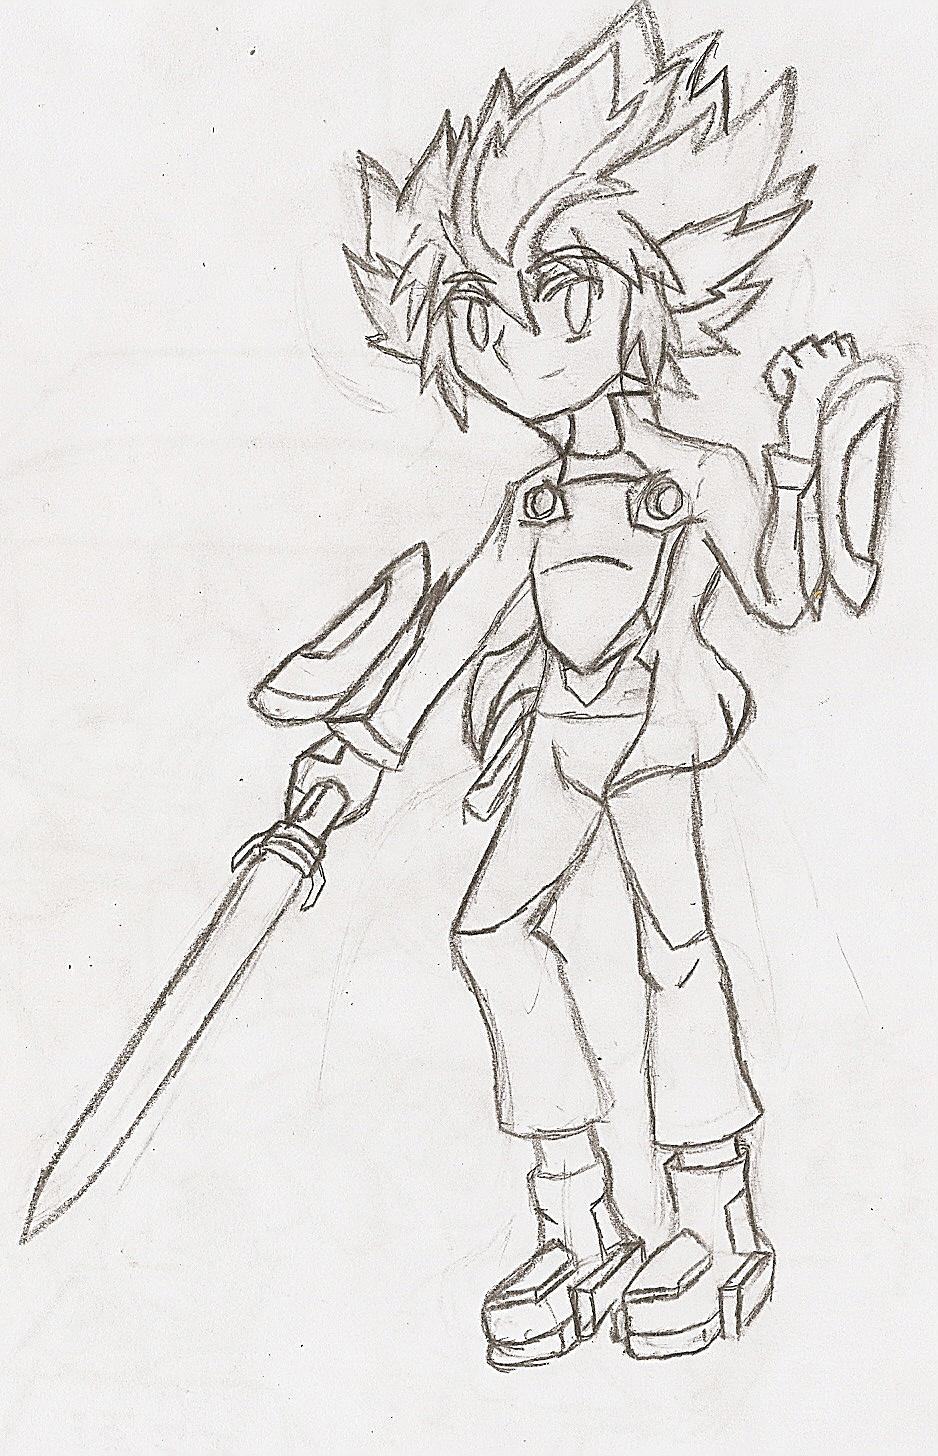 Medabot Ryu: Human (Sketch) by NeonNeoz